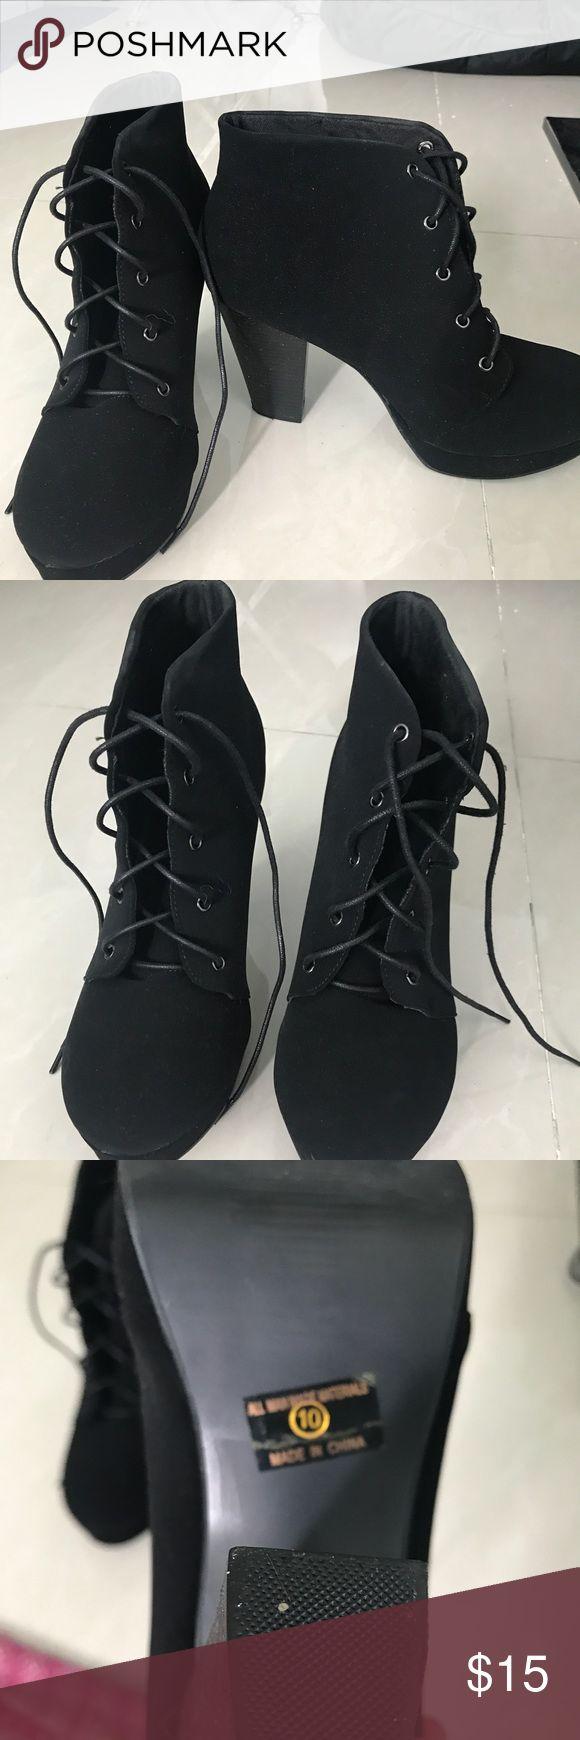 Black Heeled Booties Black heeled booties from jeans warehouse. US SZ 10. Never worn, selling b/c I wear a 9. Jeans Warehouse Shoes Heels